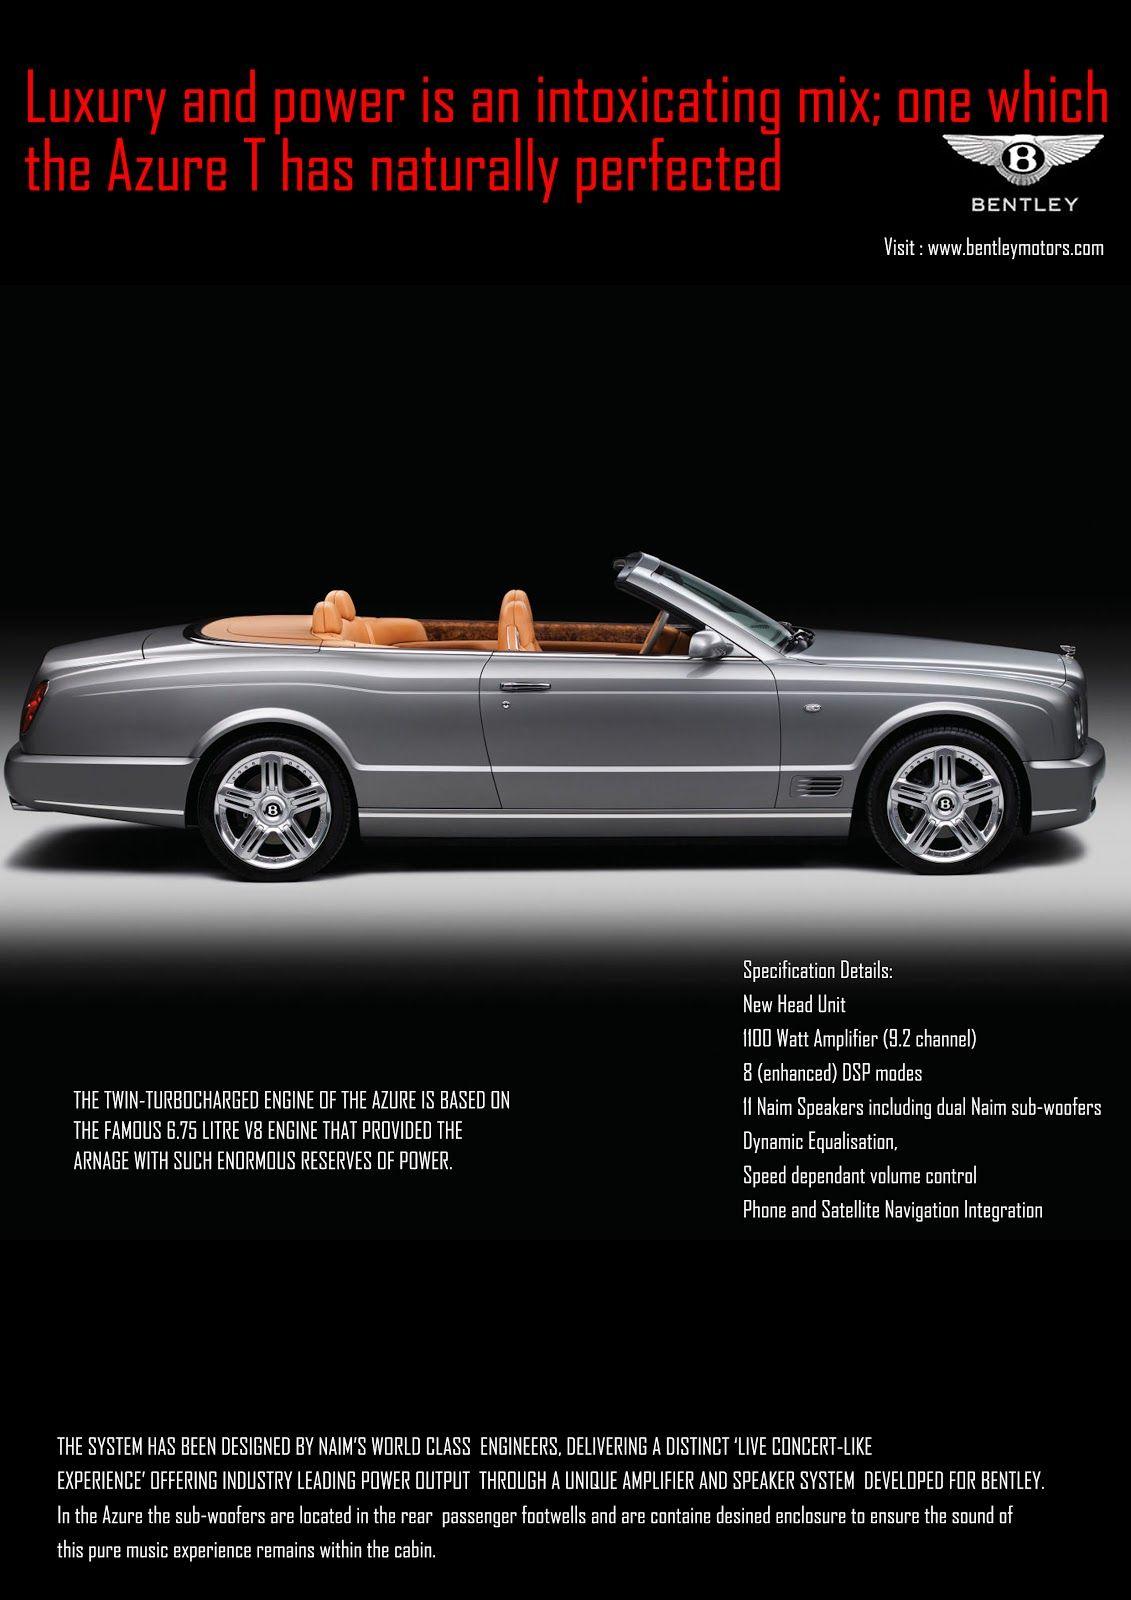 Bentley Car Ads Mayur Savla Print Ad For Bentley Car Ads